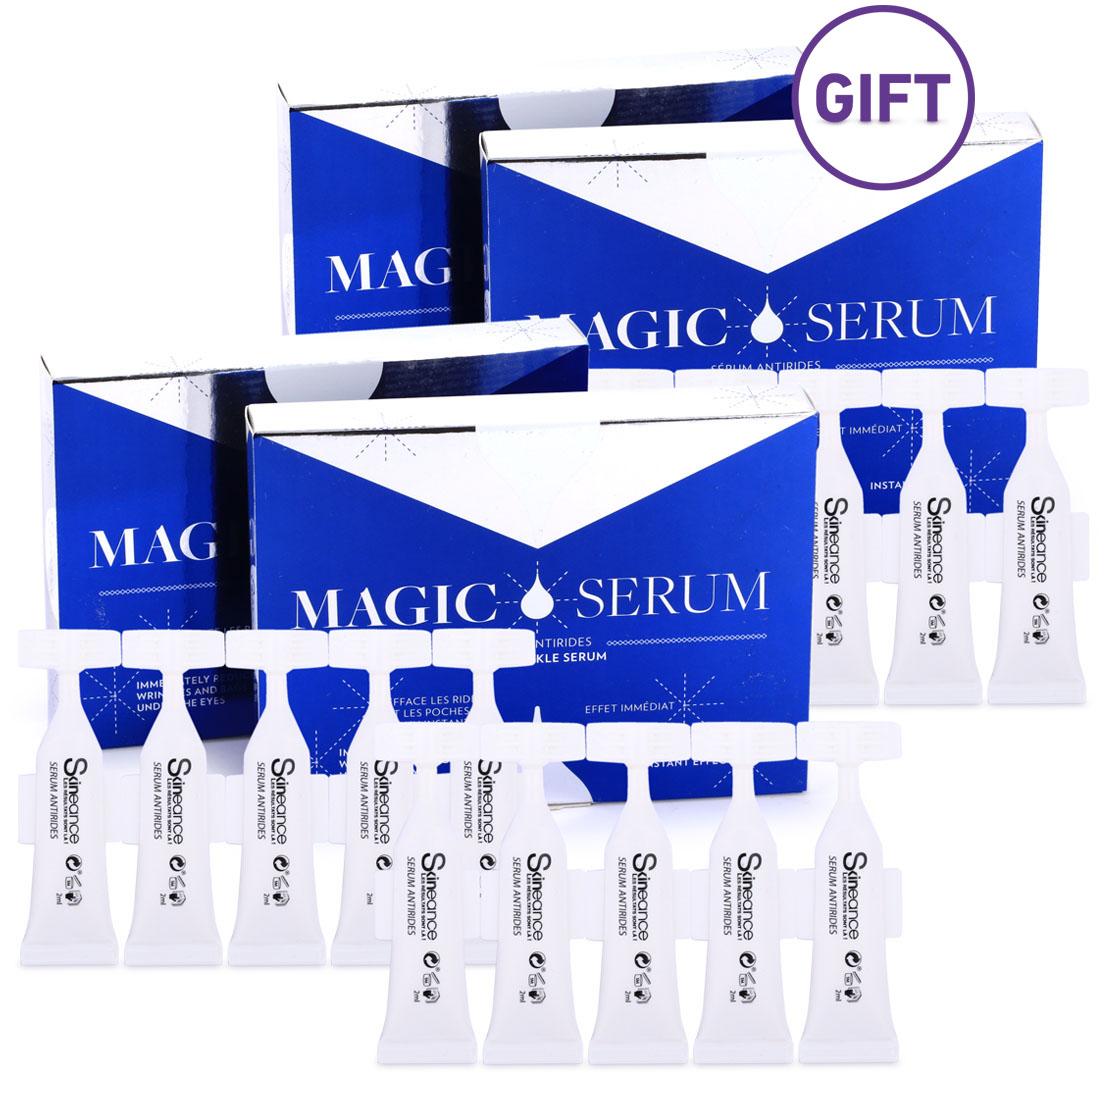 Magic Serum Buy 2 & Get 2 Free